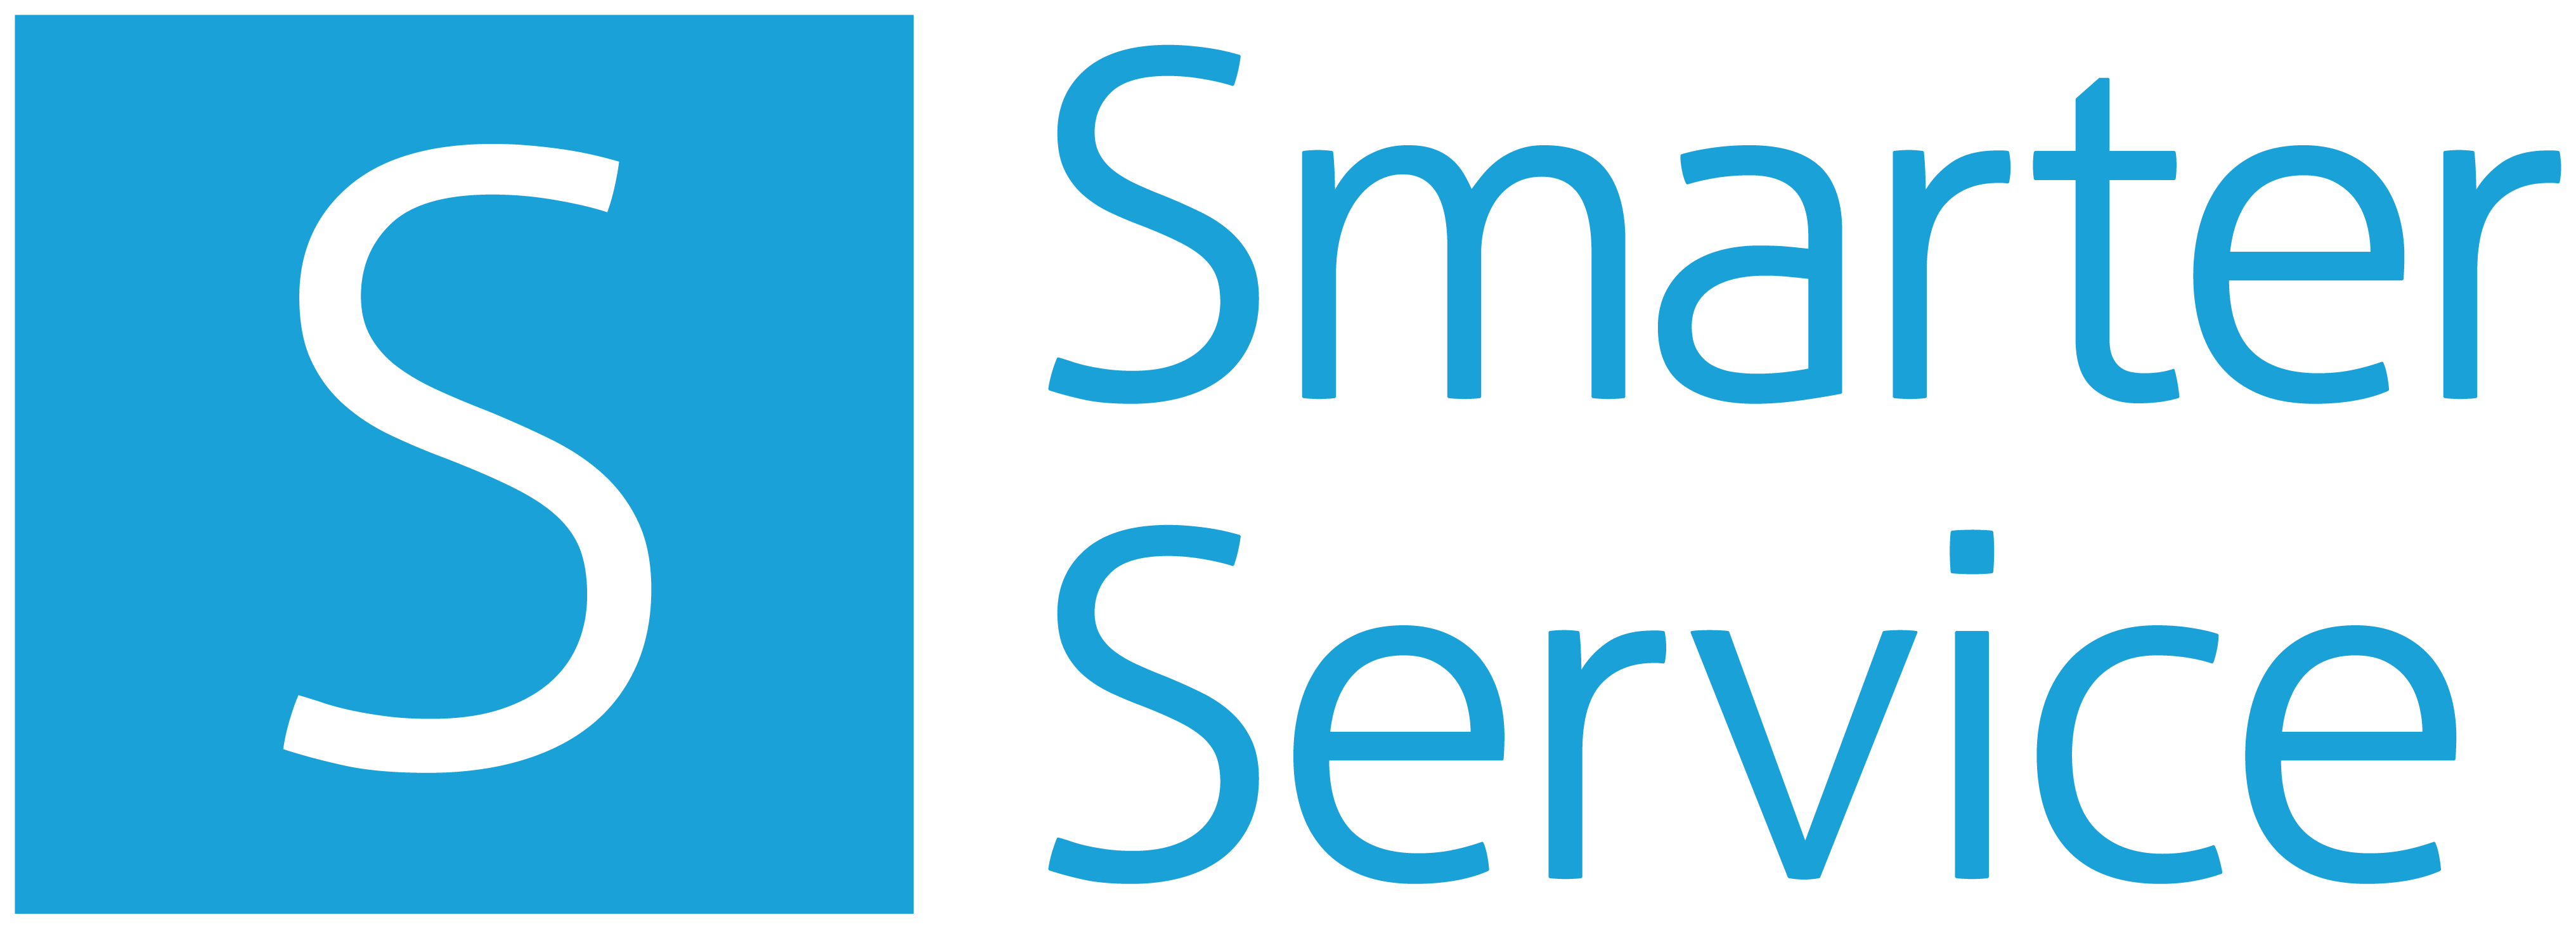 Smarter Service